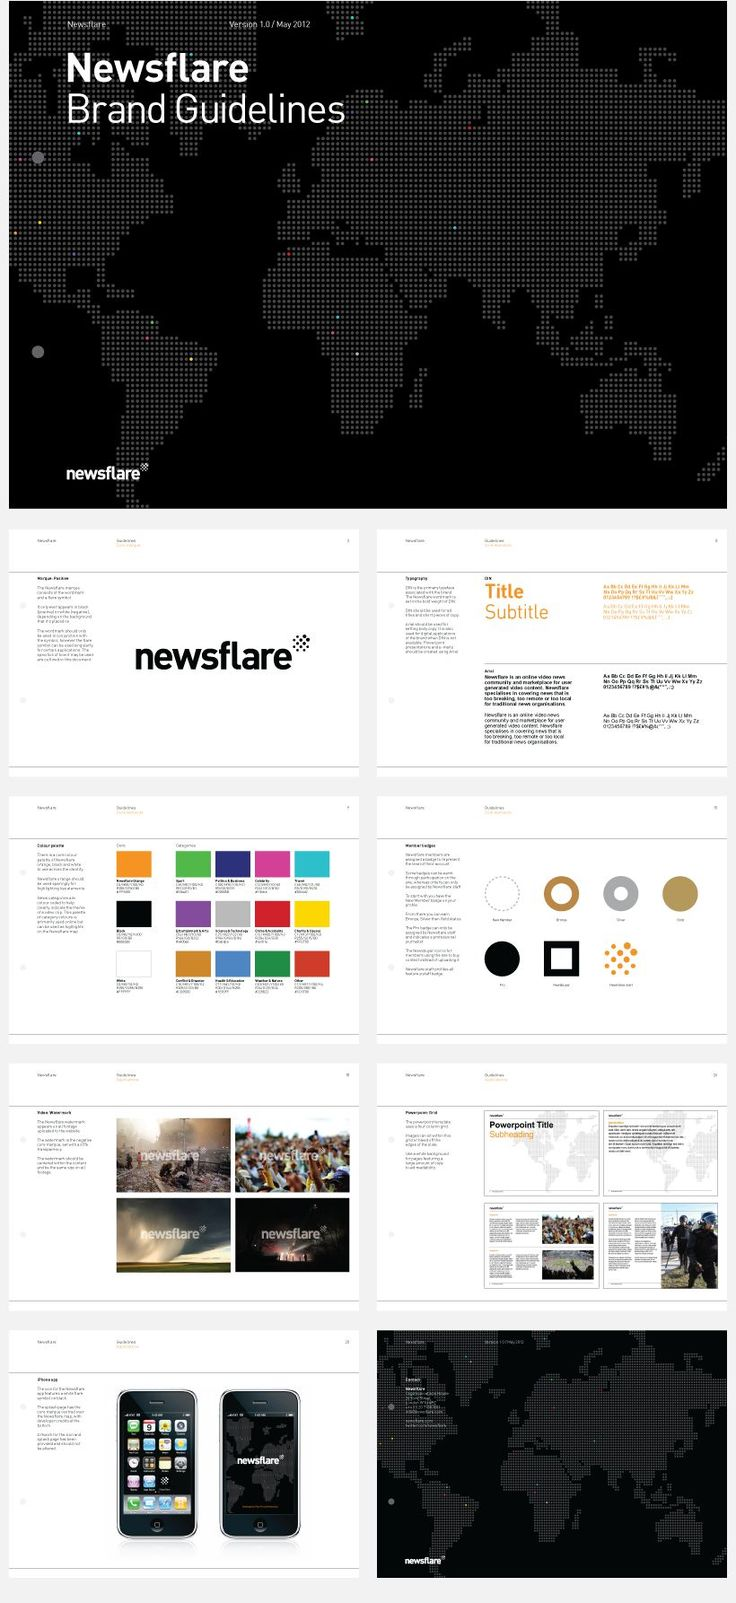 10 best Design Brand Guidelines images on Pinterest